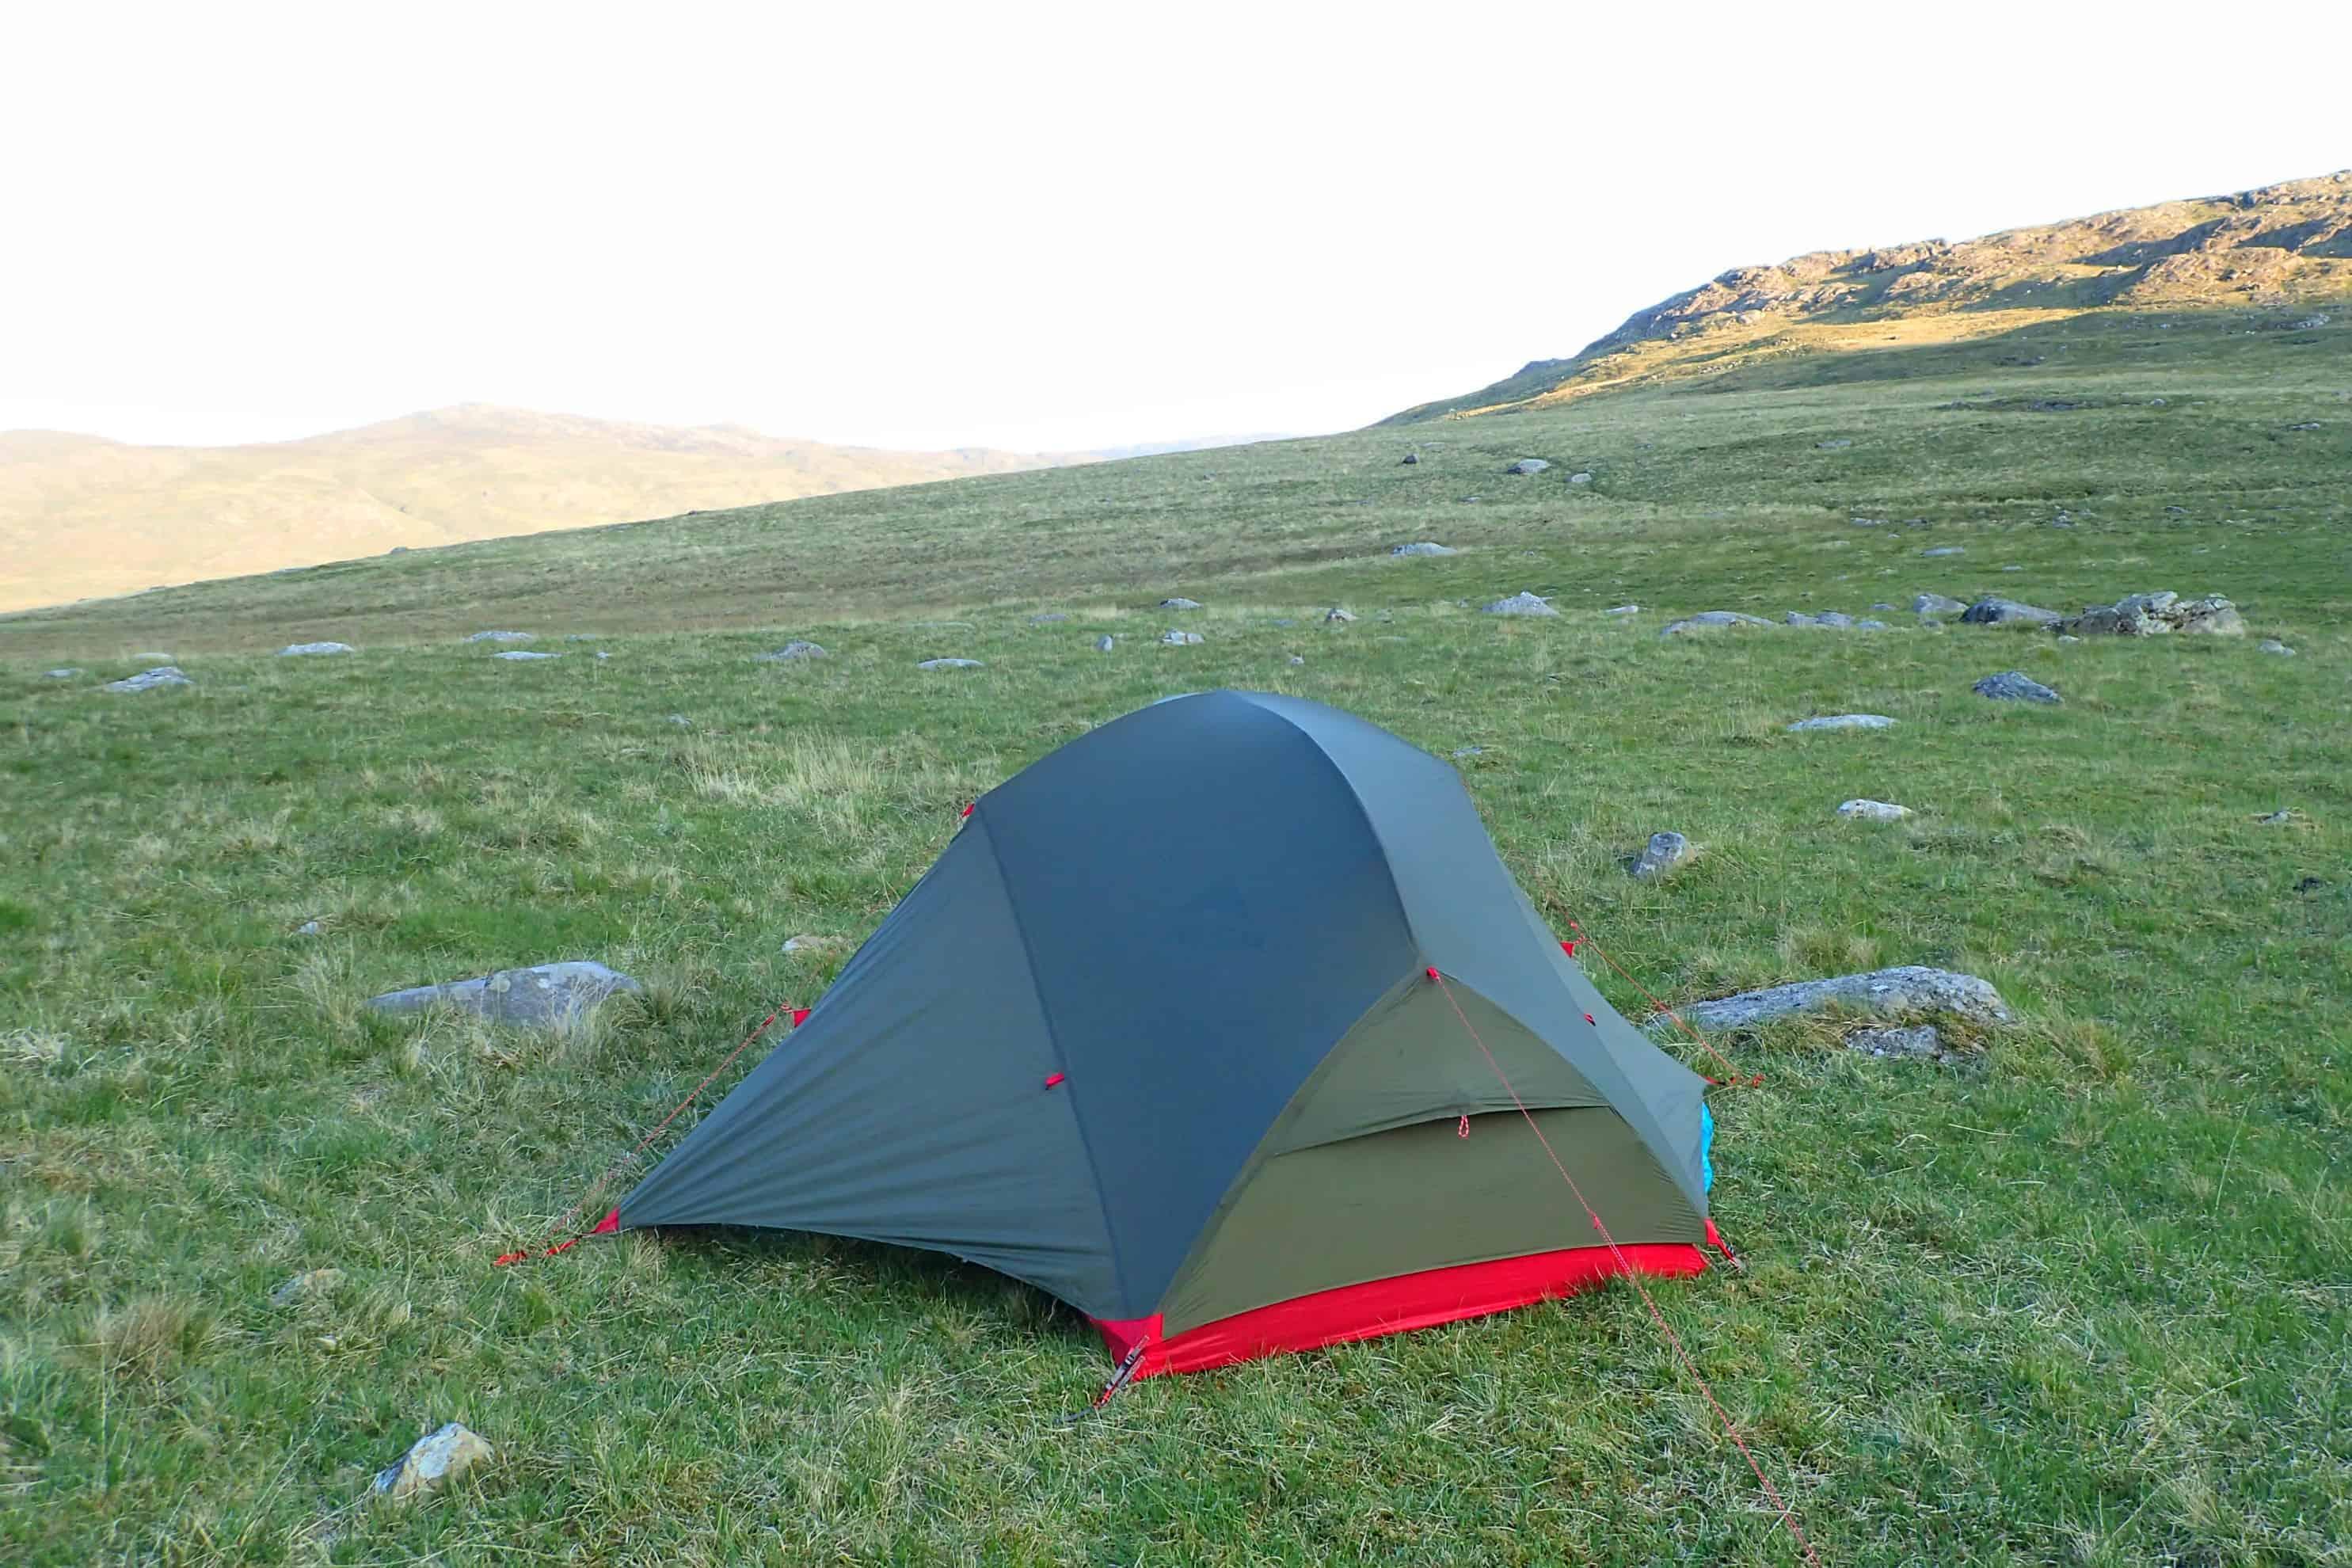 MSR Hubba Hubba Tent Review